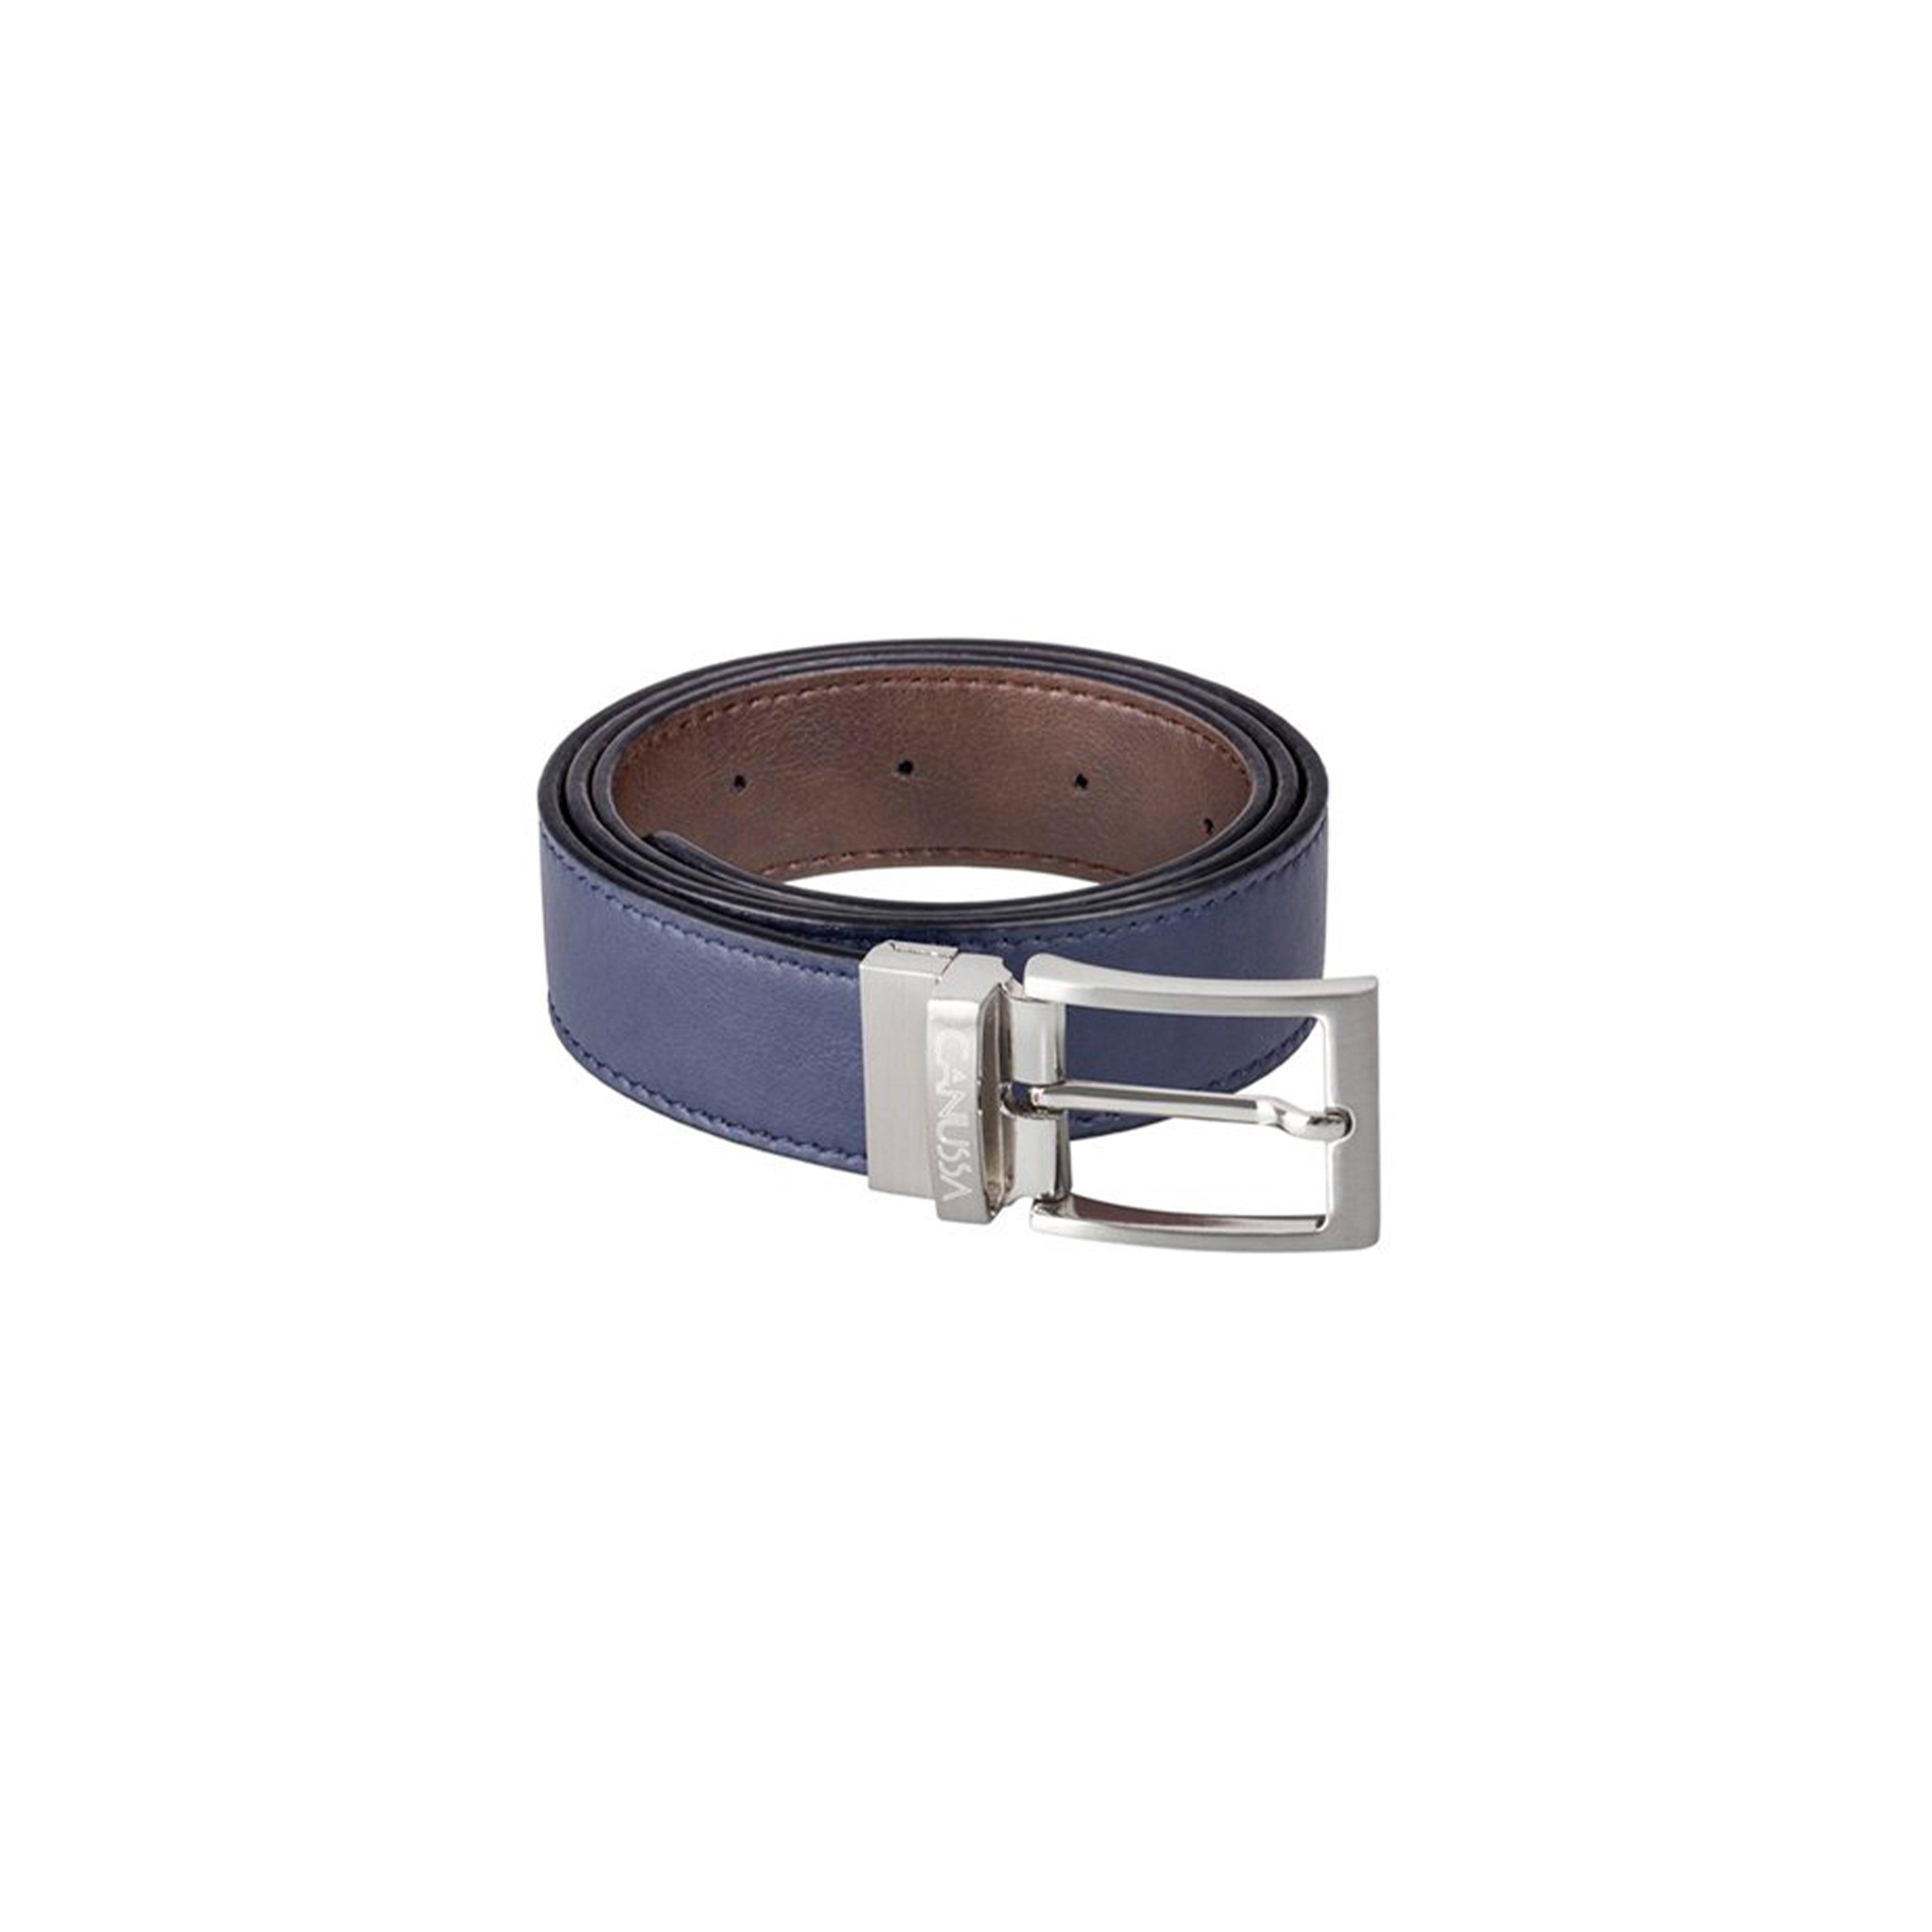 Reverse Vegan Belt – Reversible Blue/Brown